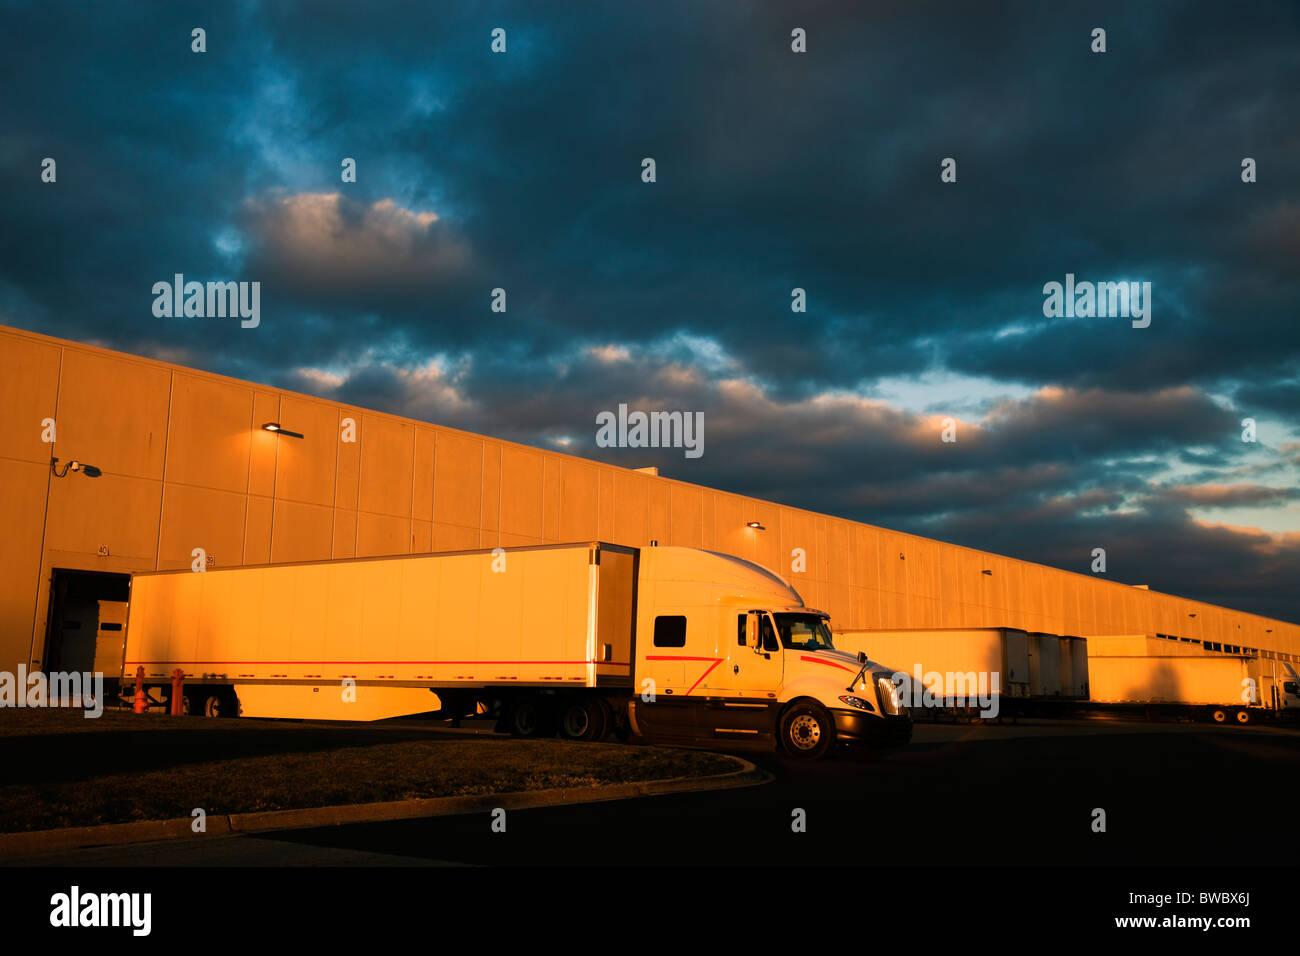 Dramatic sunset above distribution warehouse - Stock Image